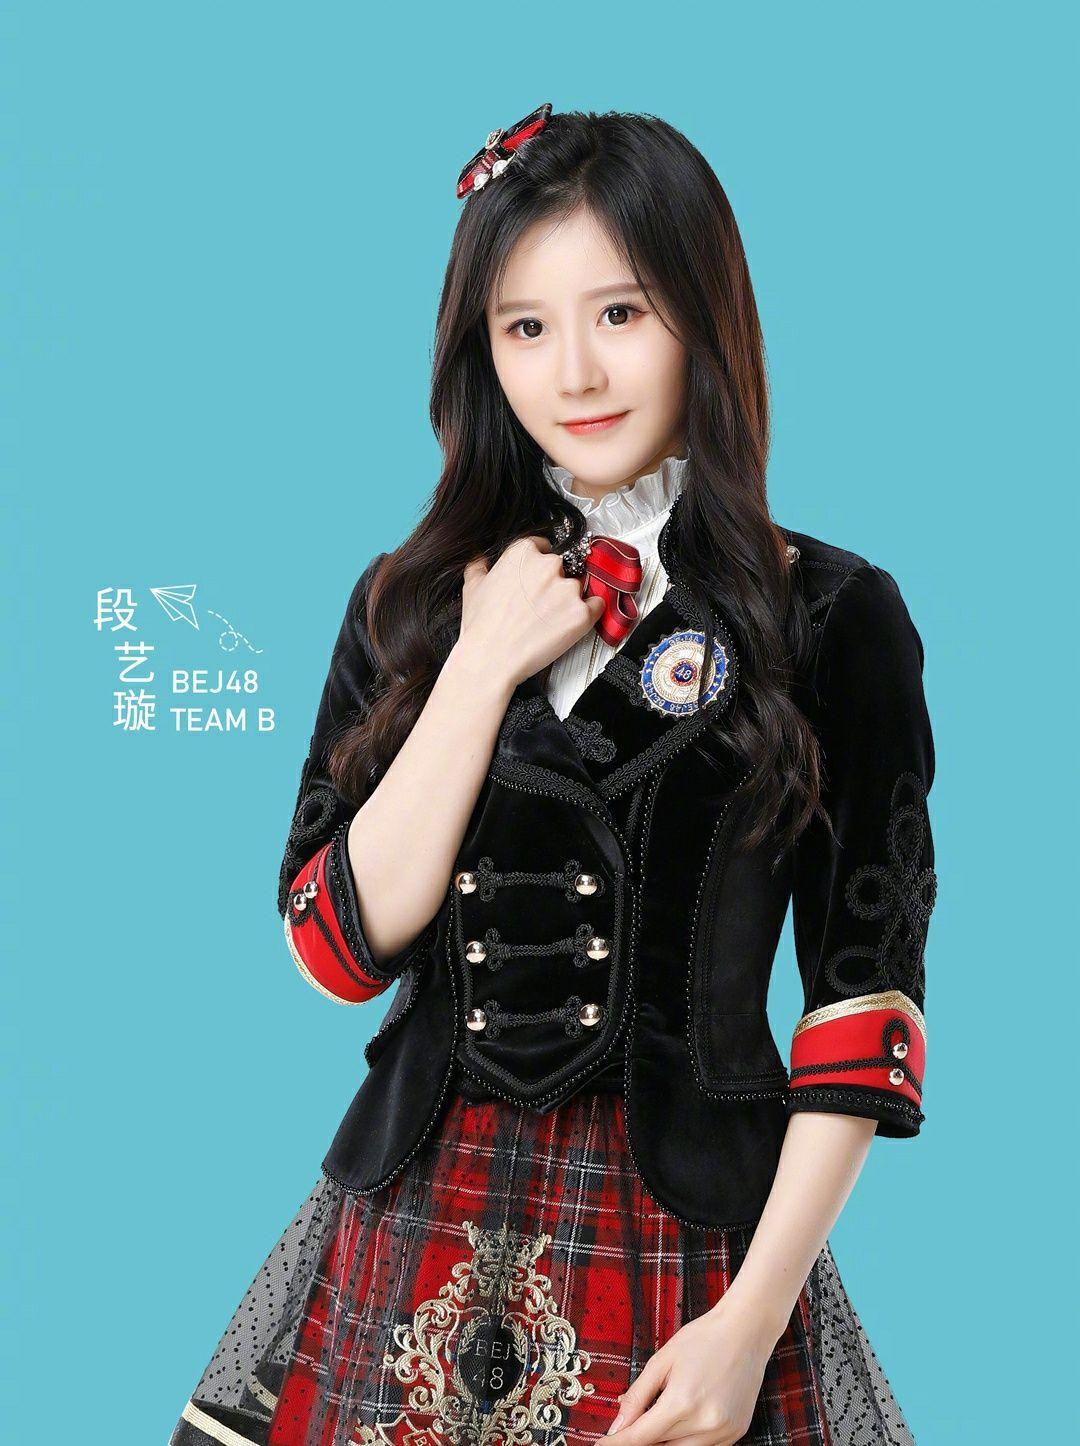 BEJ48段艺璇,多年努力拼搏,换来今天的实至名归